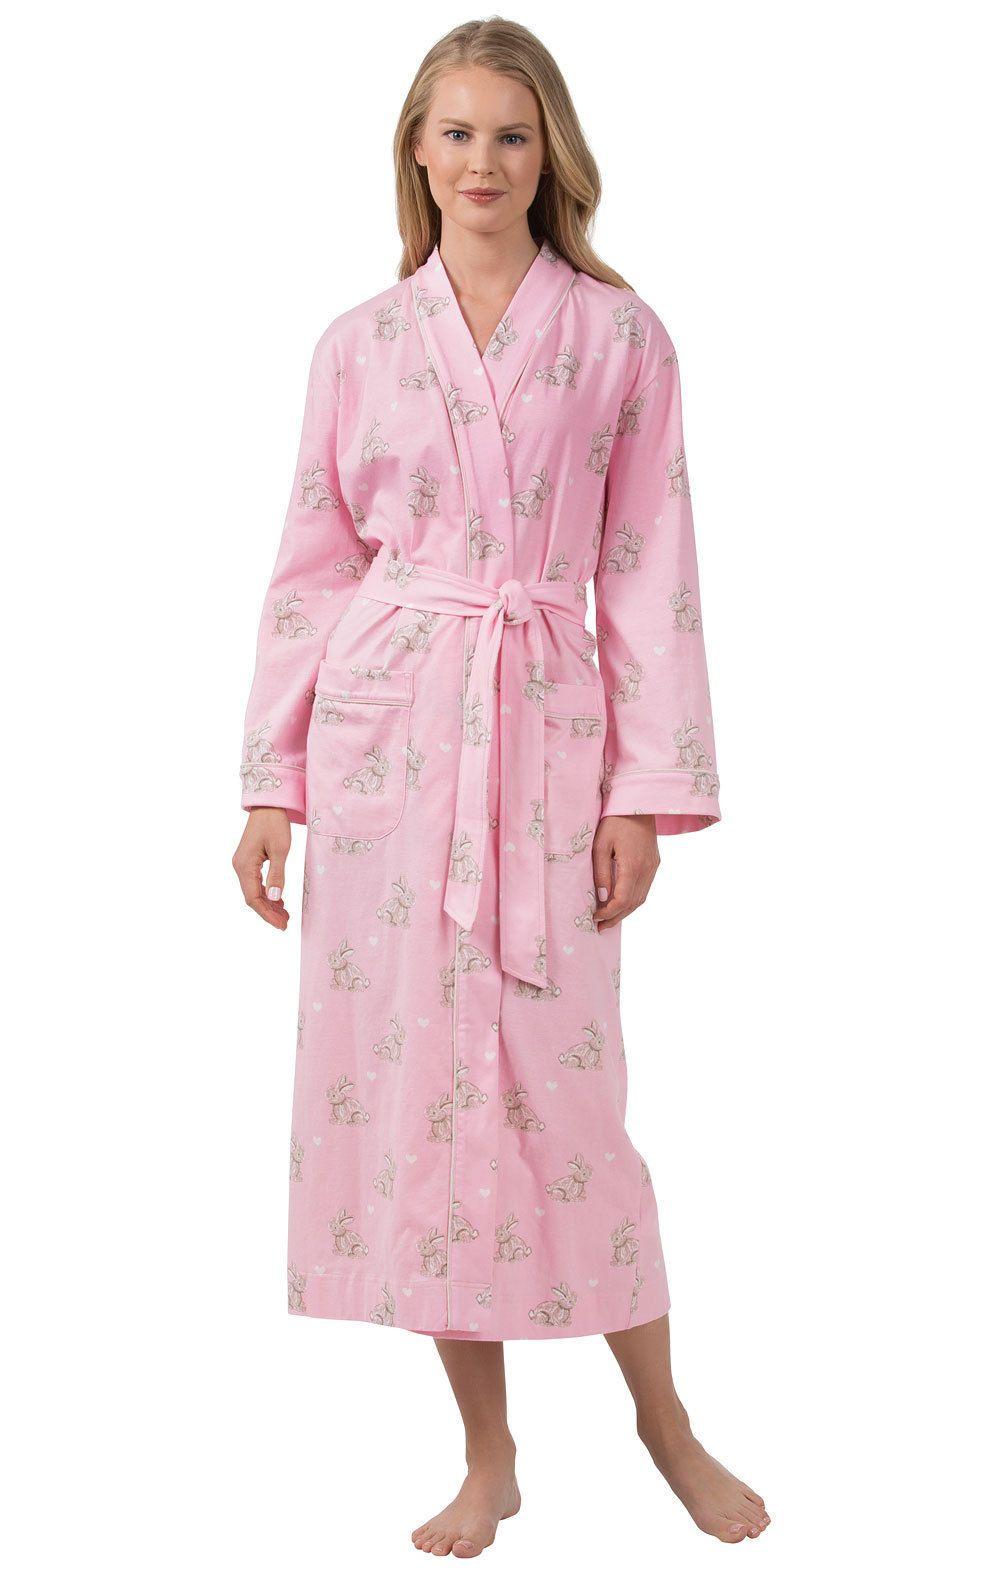 PajamaGram Women s Cotton Sleepwear Ladies Soft Printed Long Robe  Cotton   Ladies  Long   bc8a8ed0f7